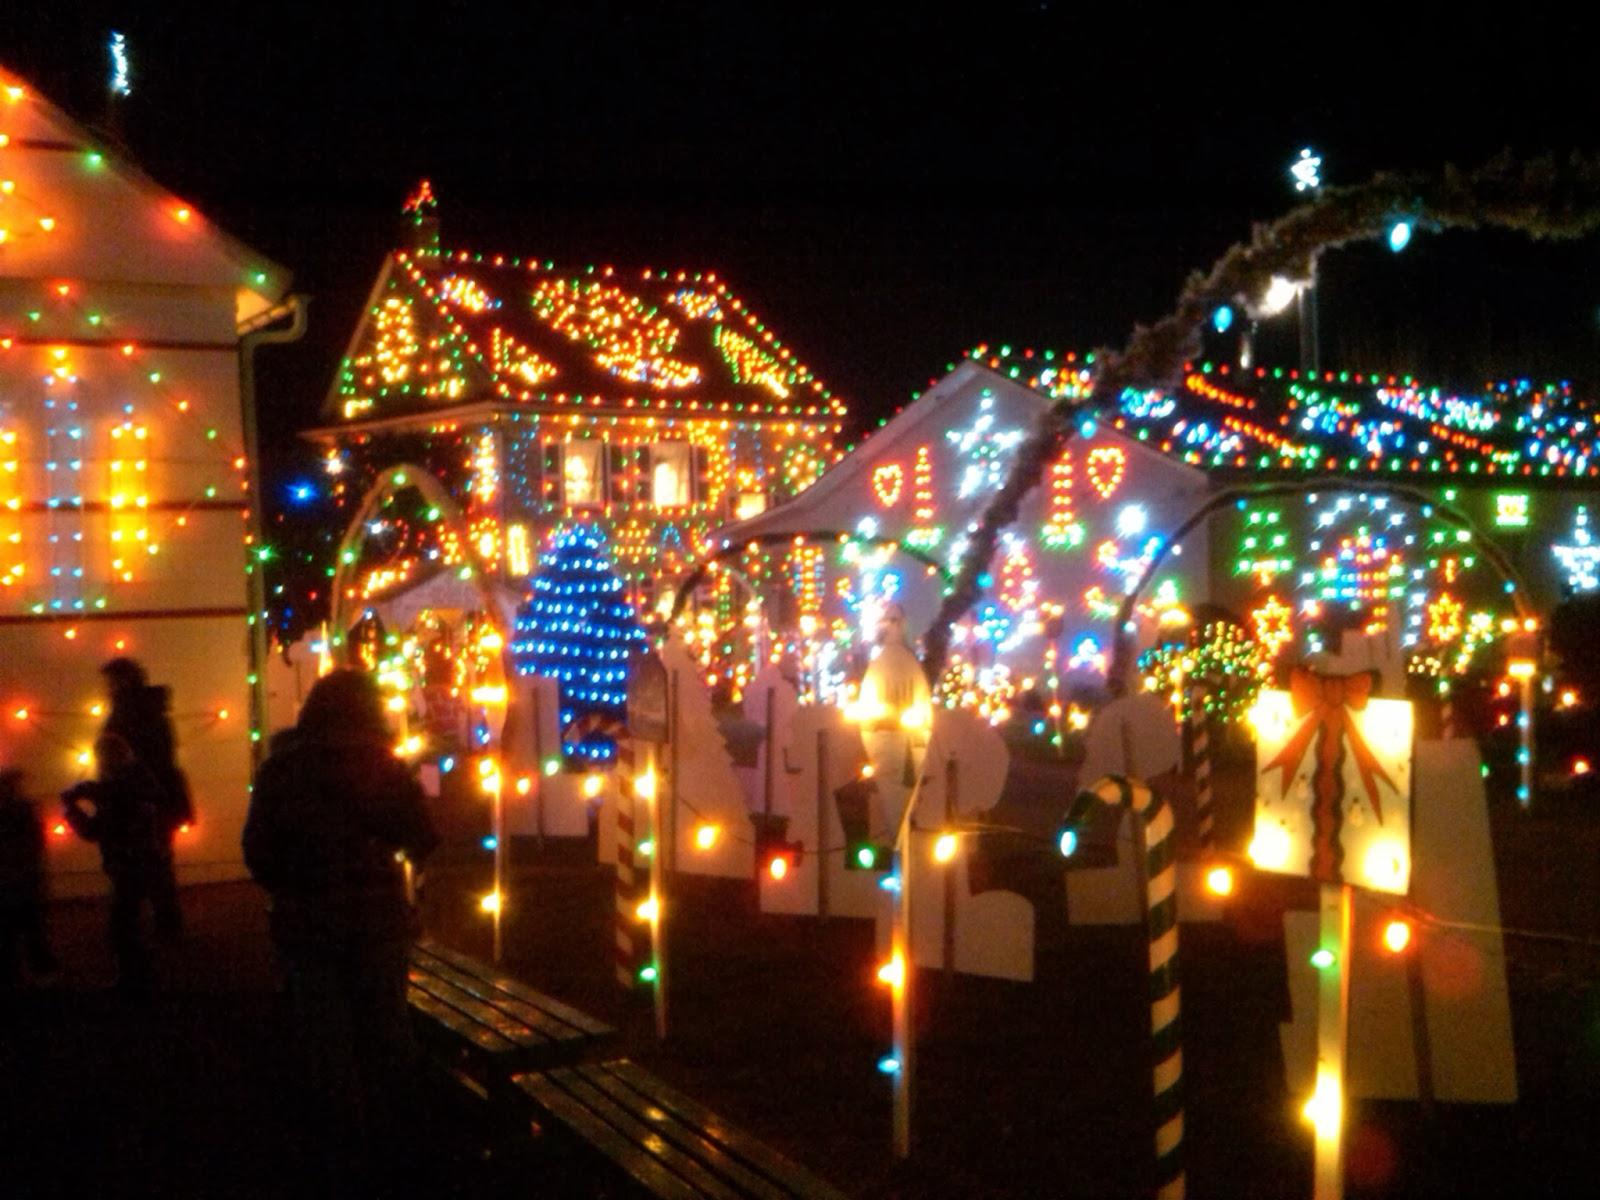 Koziar S Christmas Village Bernville Pa Interesting